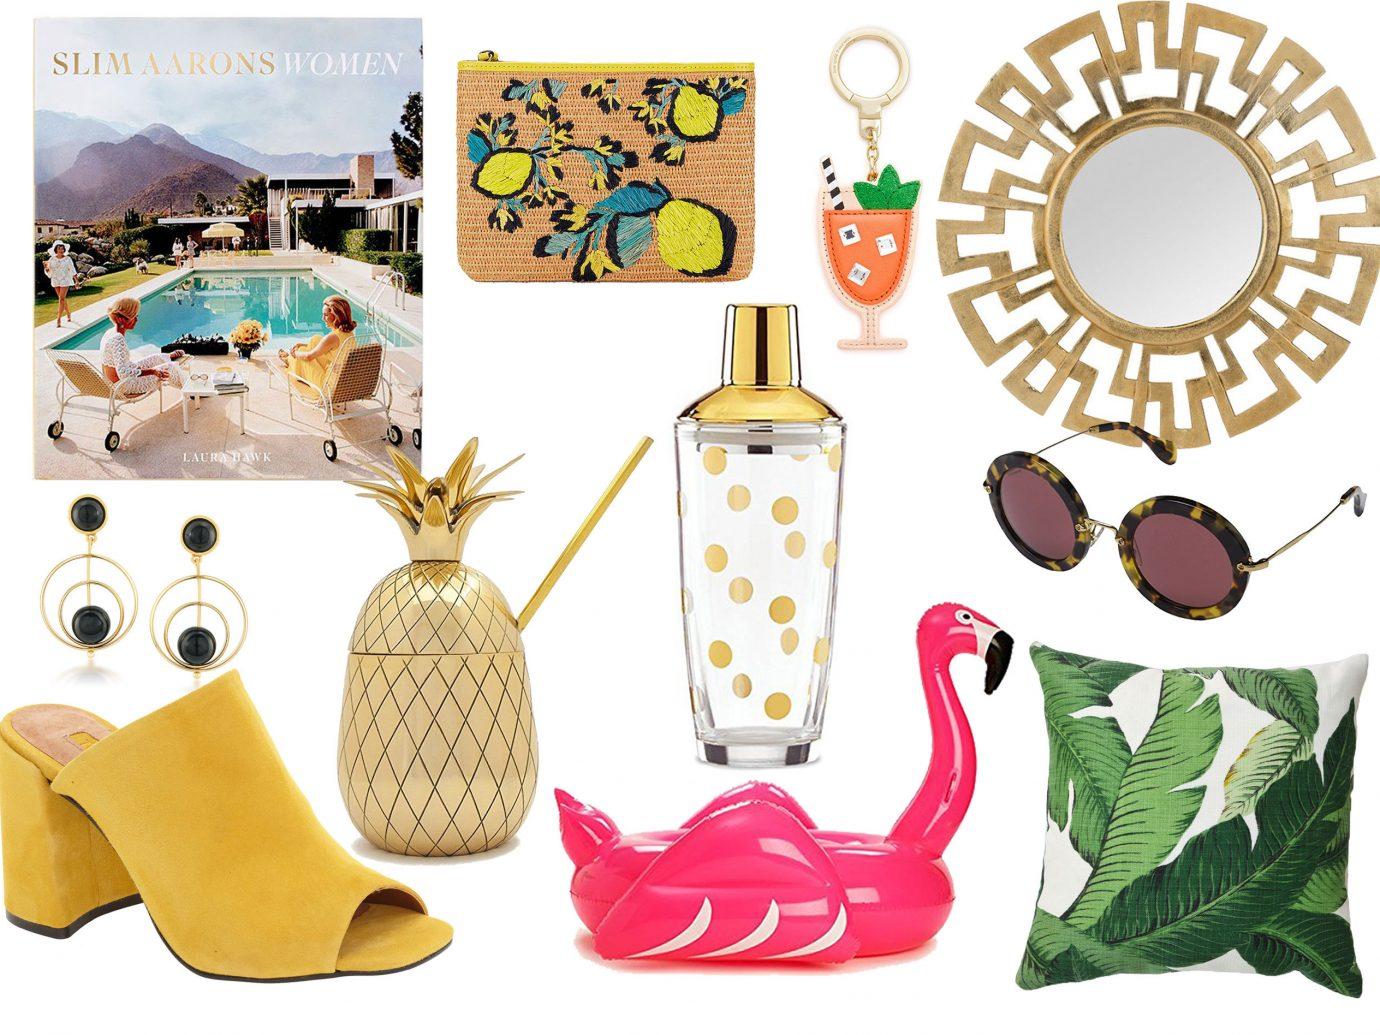 Hotels cartoon product items brand pattern Design illustration several